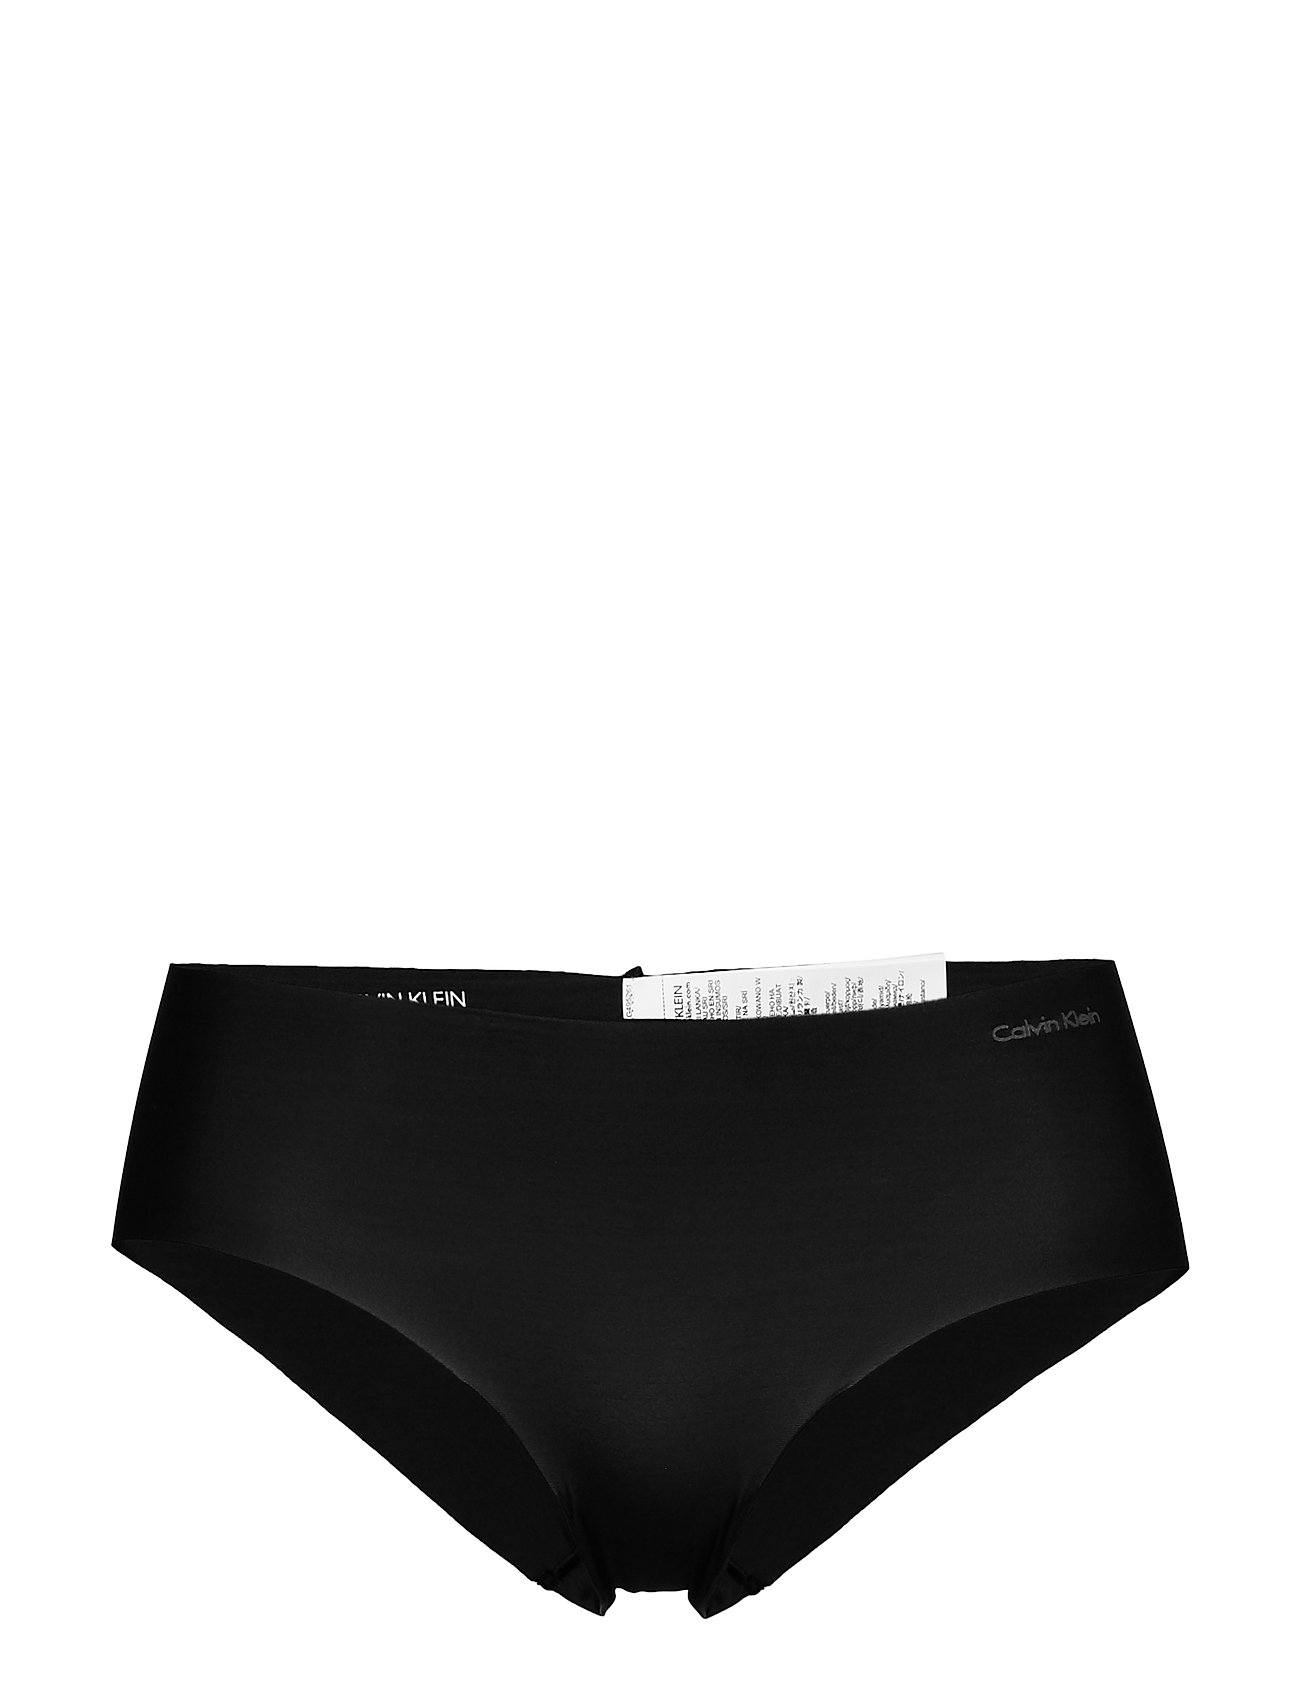 Calvin Klein HIPSTER - BLACK